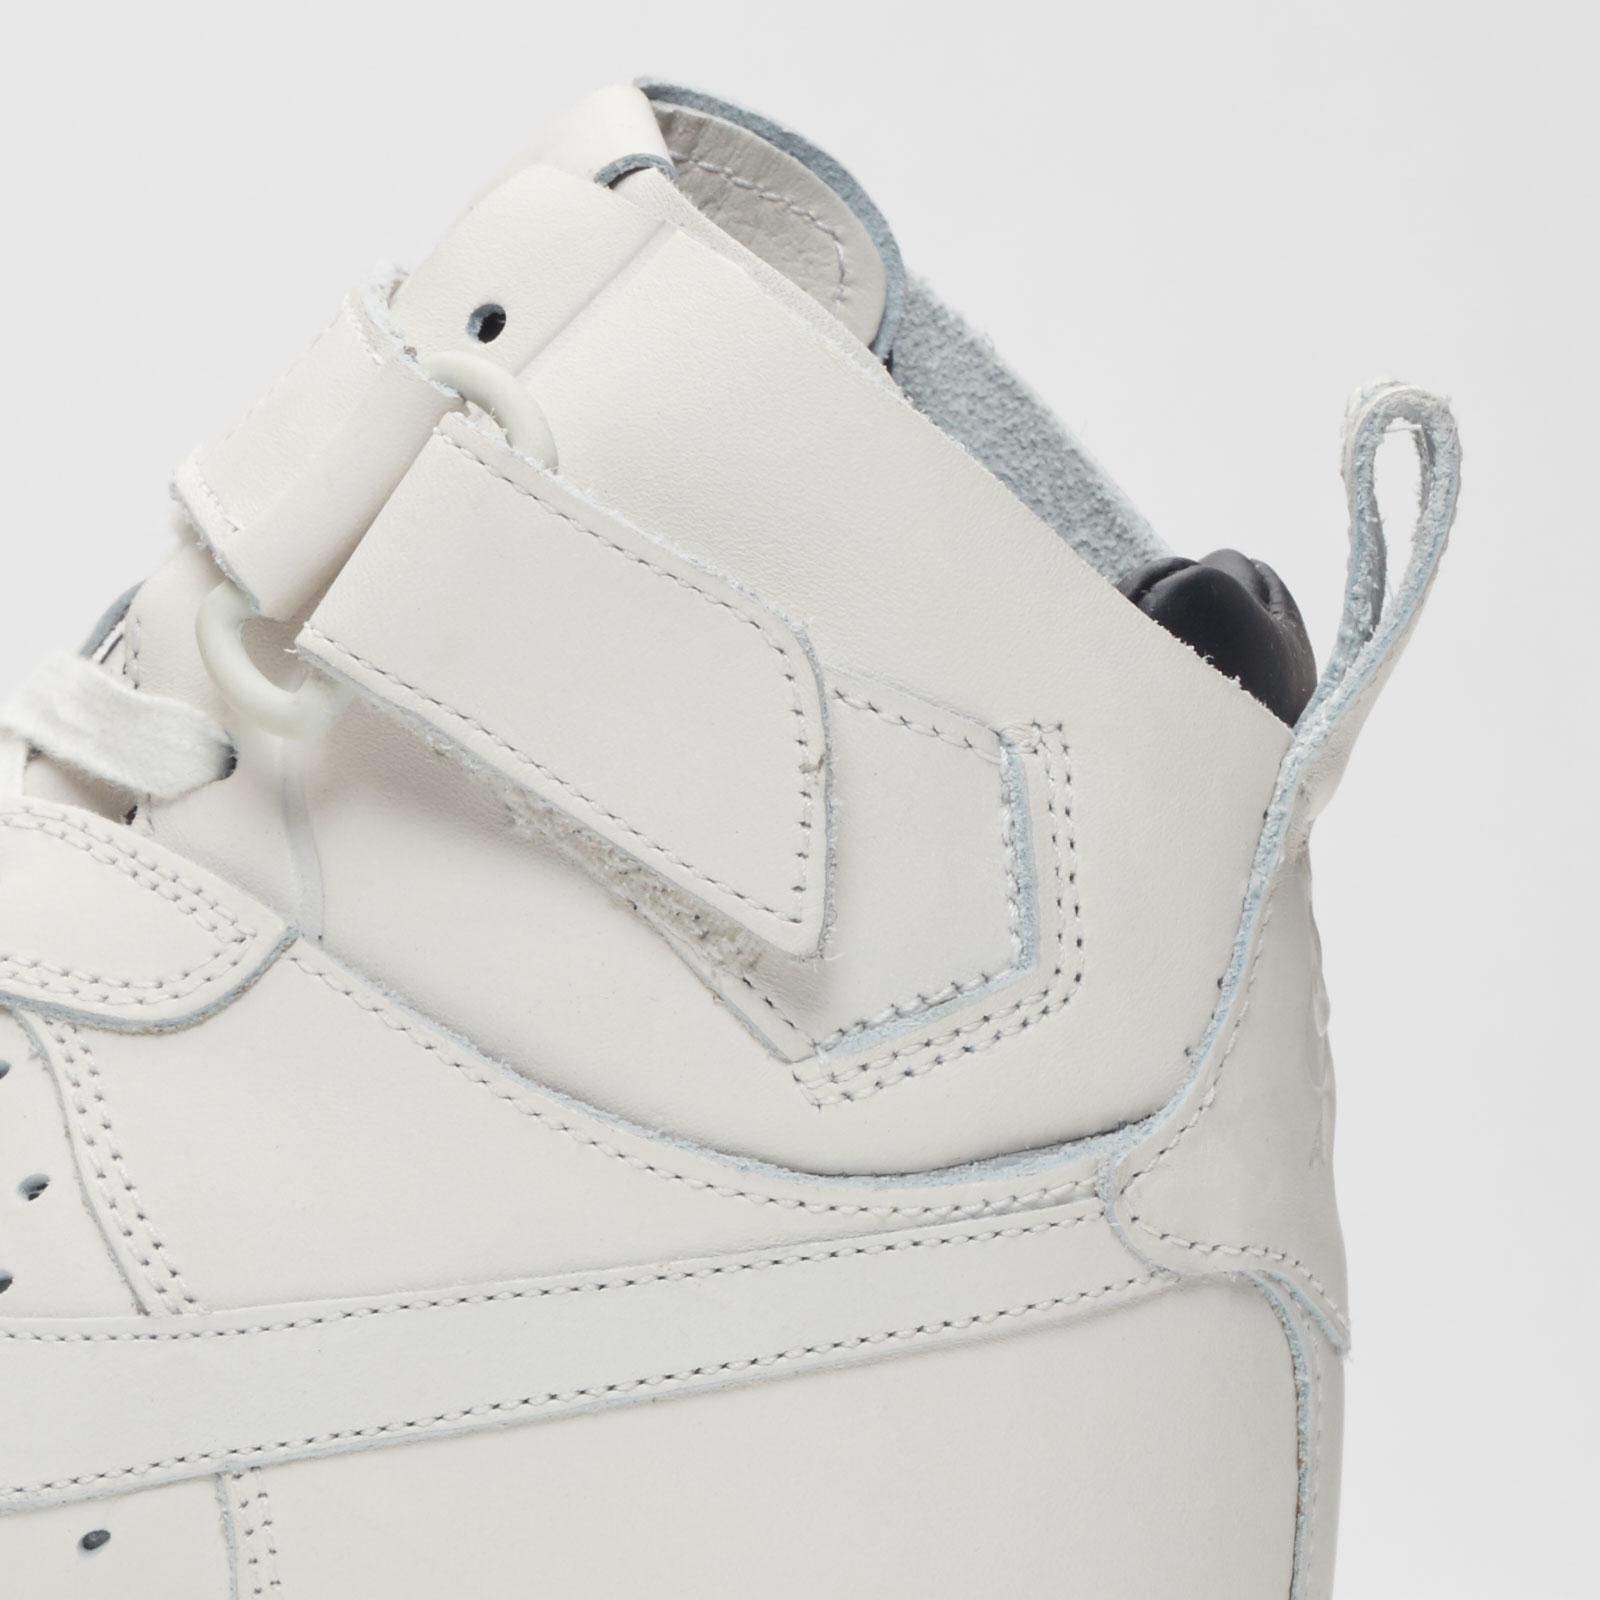 huge discount 075d8 f8647 Nike Wmns Air Force 1 Hi Cmft Tc Sp - 921071-100 - Sneakersnstuff    sneakers   streetwear online since 1999